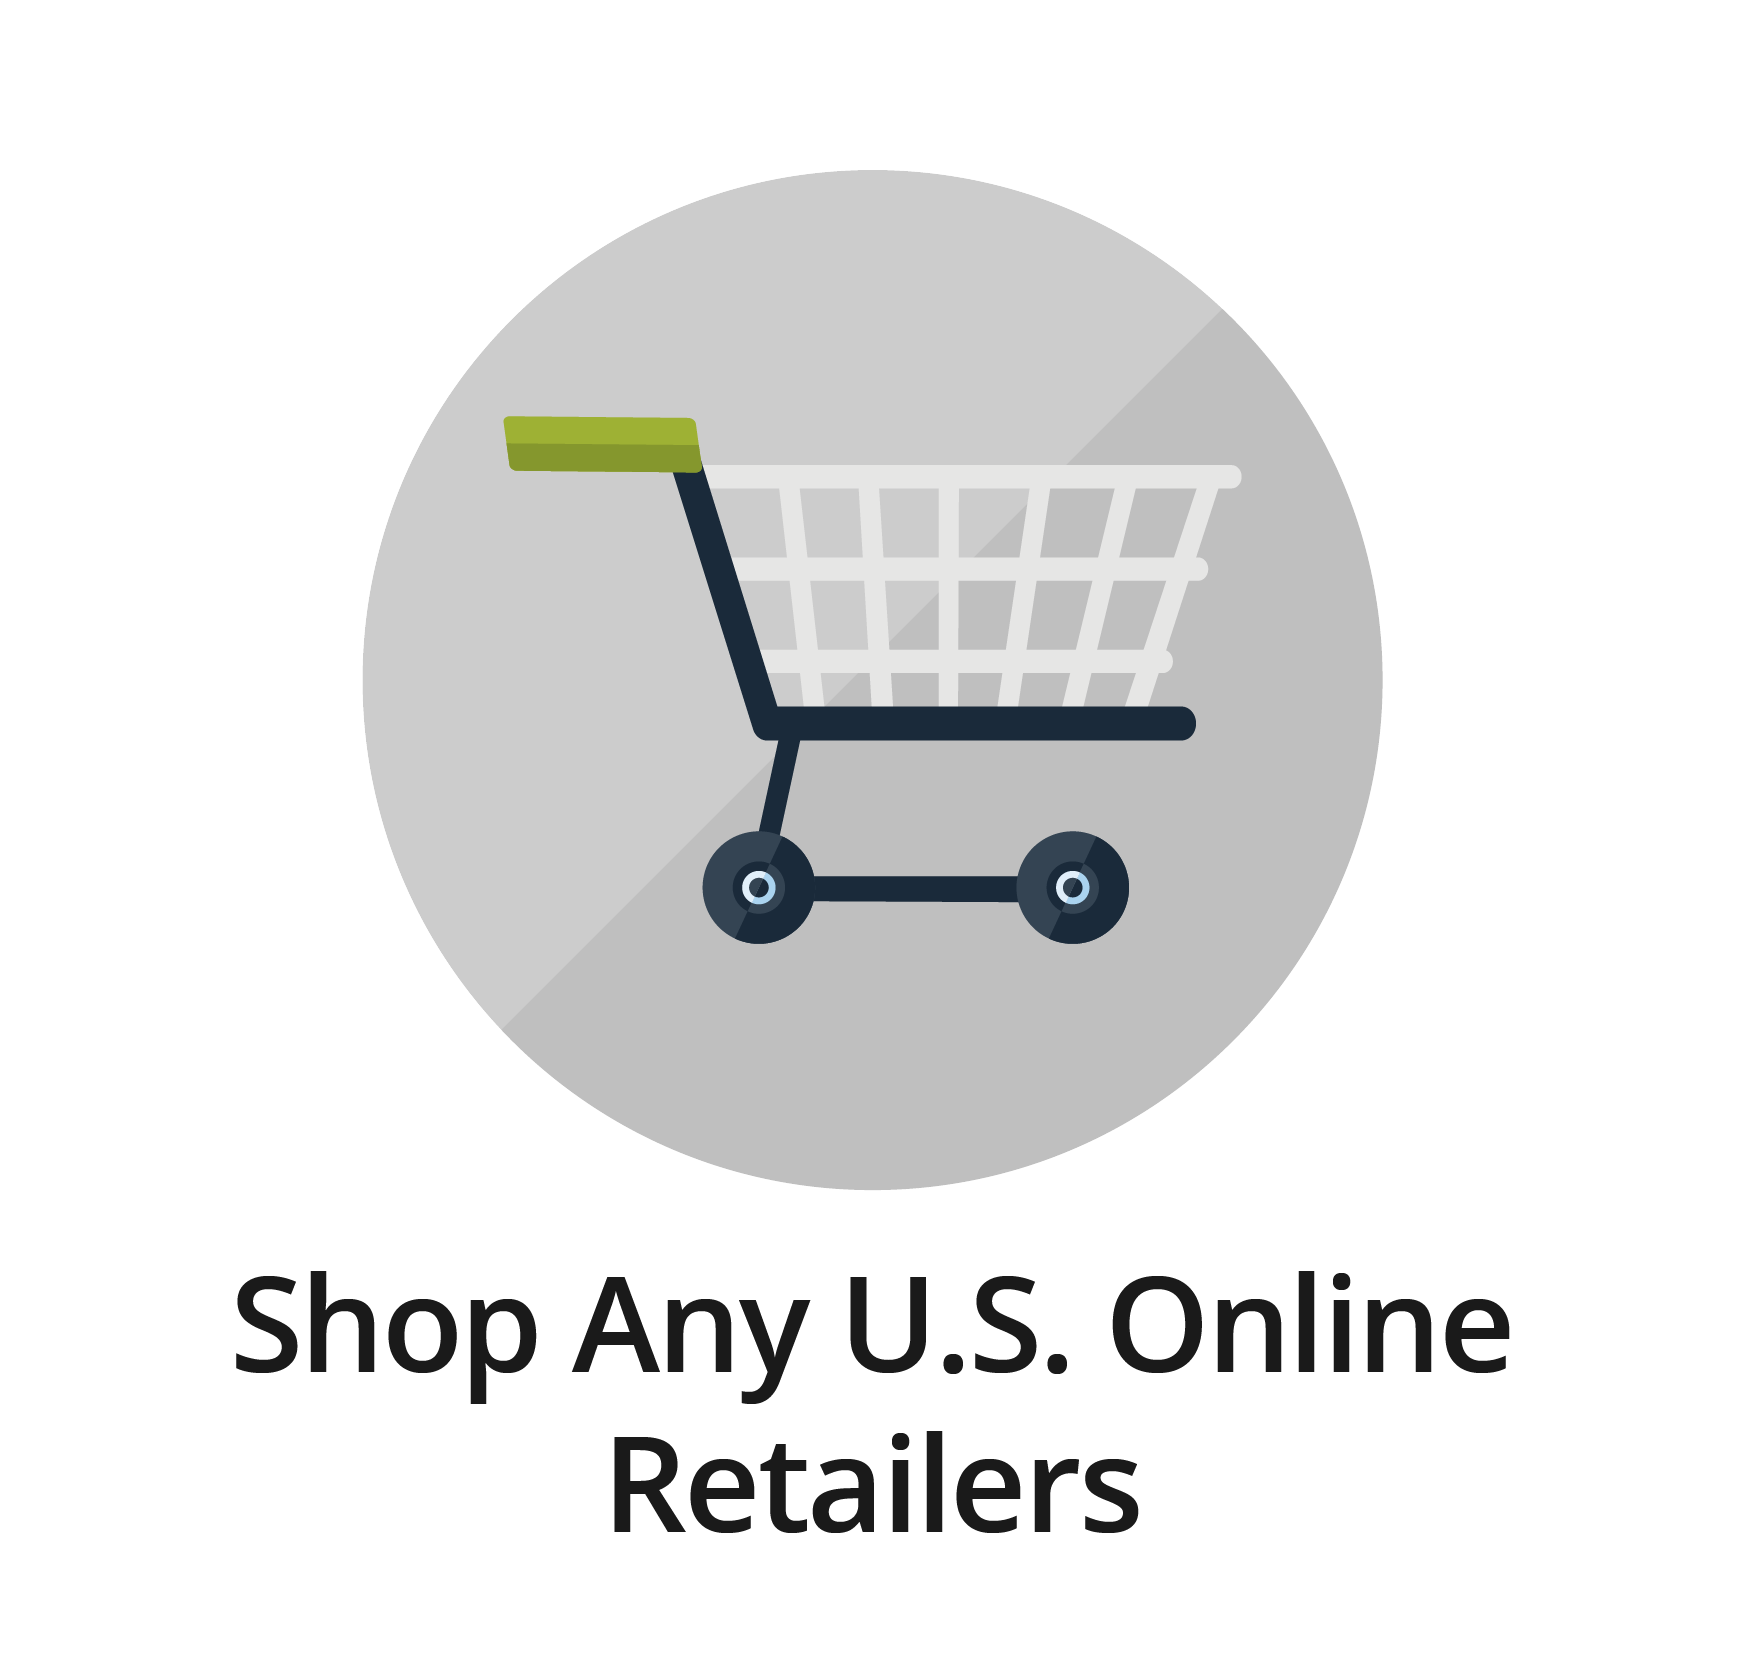 Shop Any U.S. Online Retailers